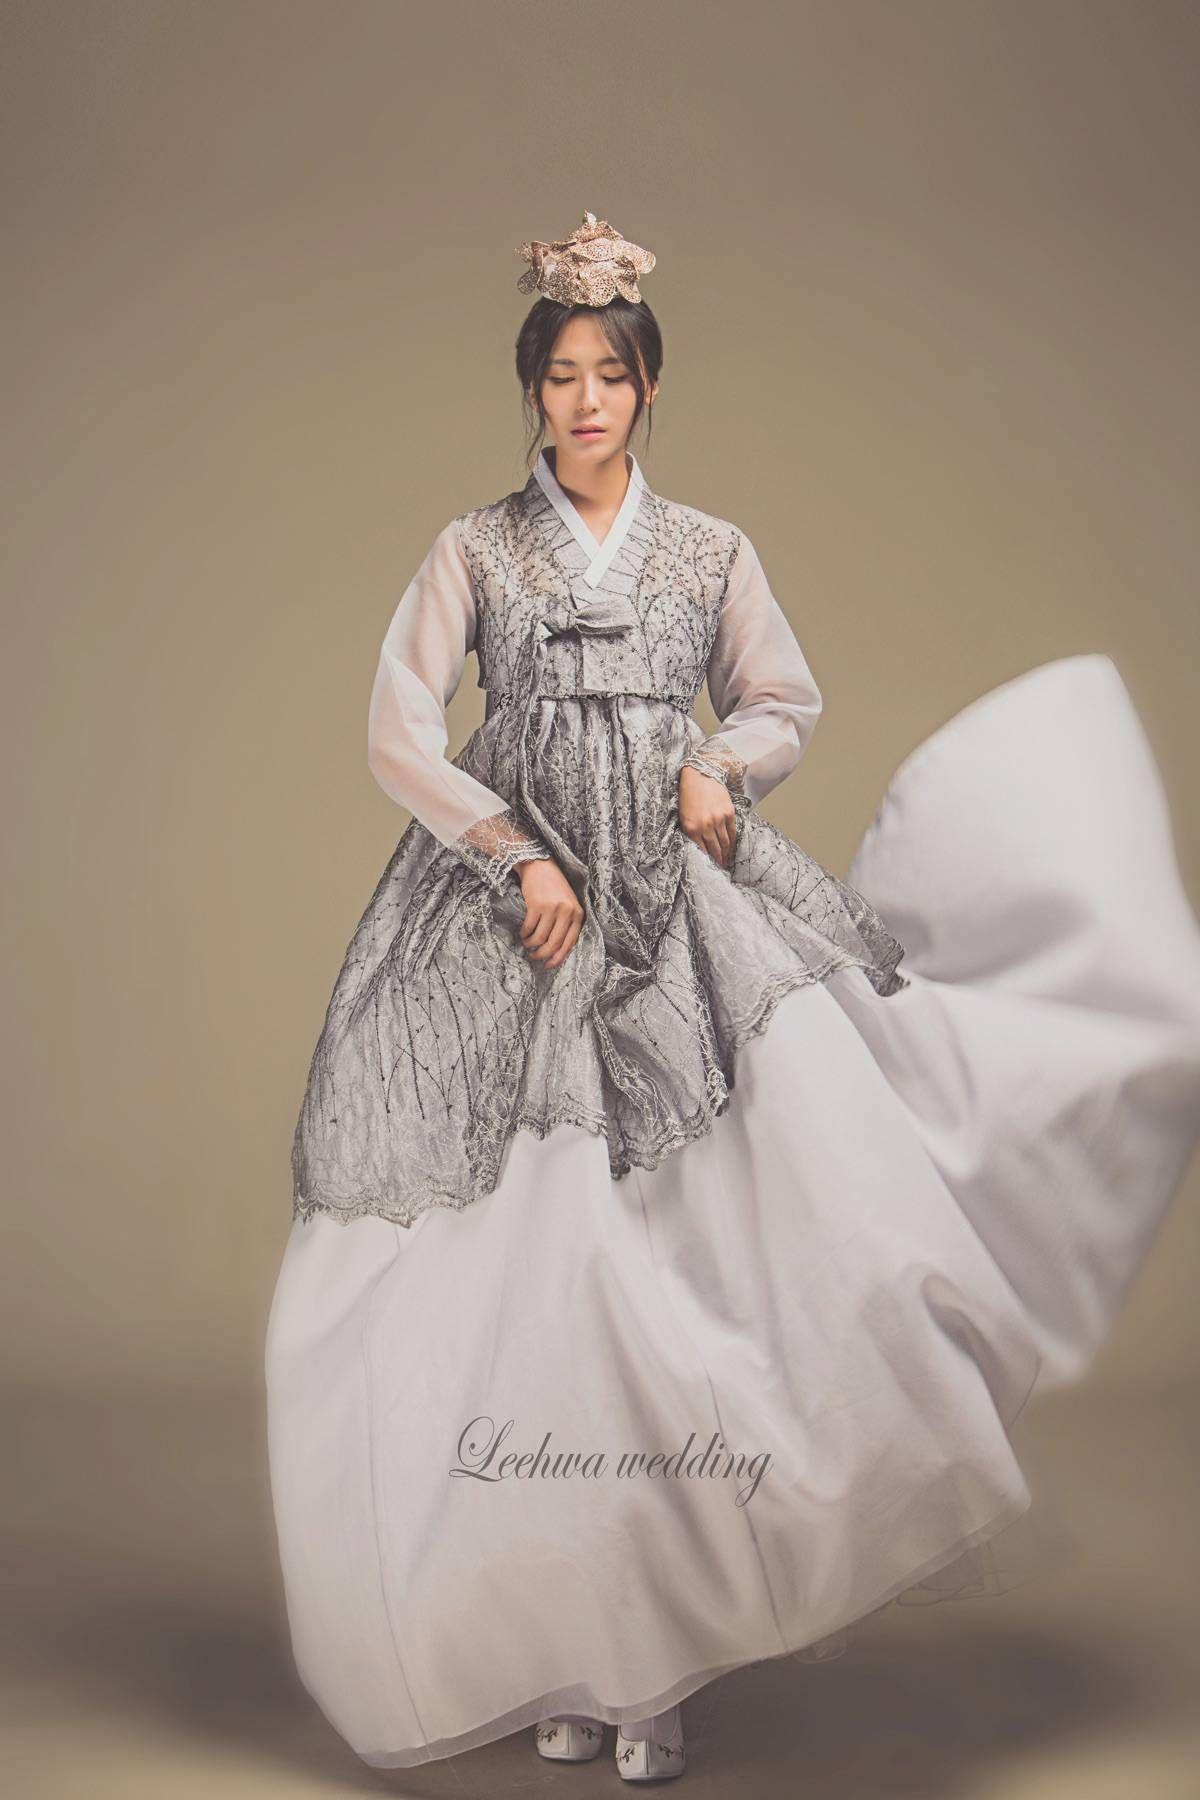 MODERN HANBOK LEEHWA WEDDING 2020 패션쇼, 패션, 한국 패션